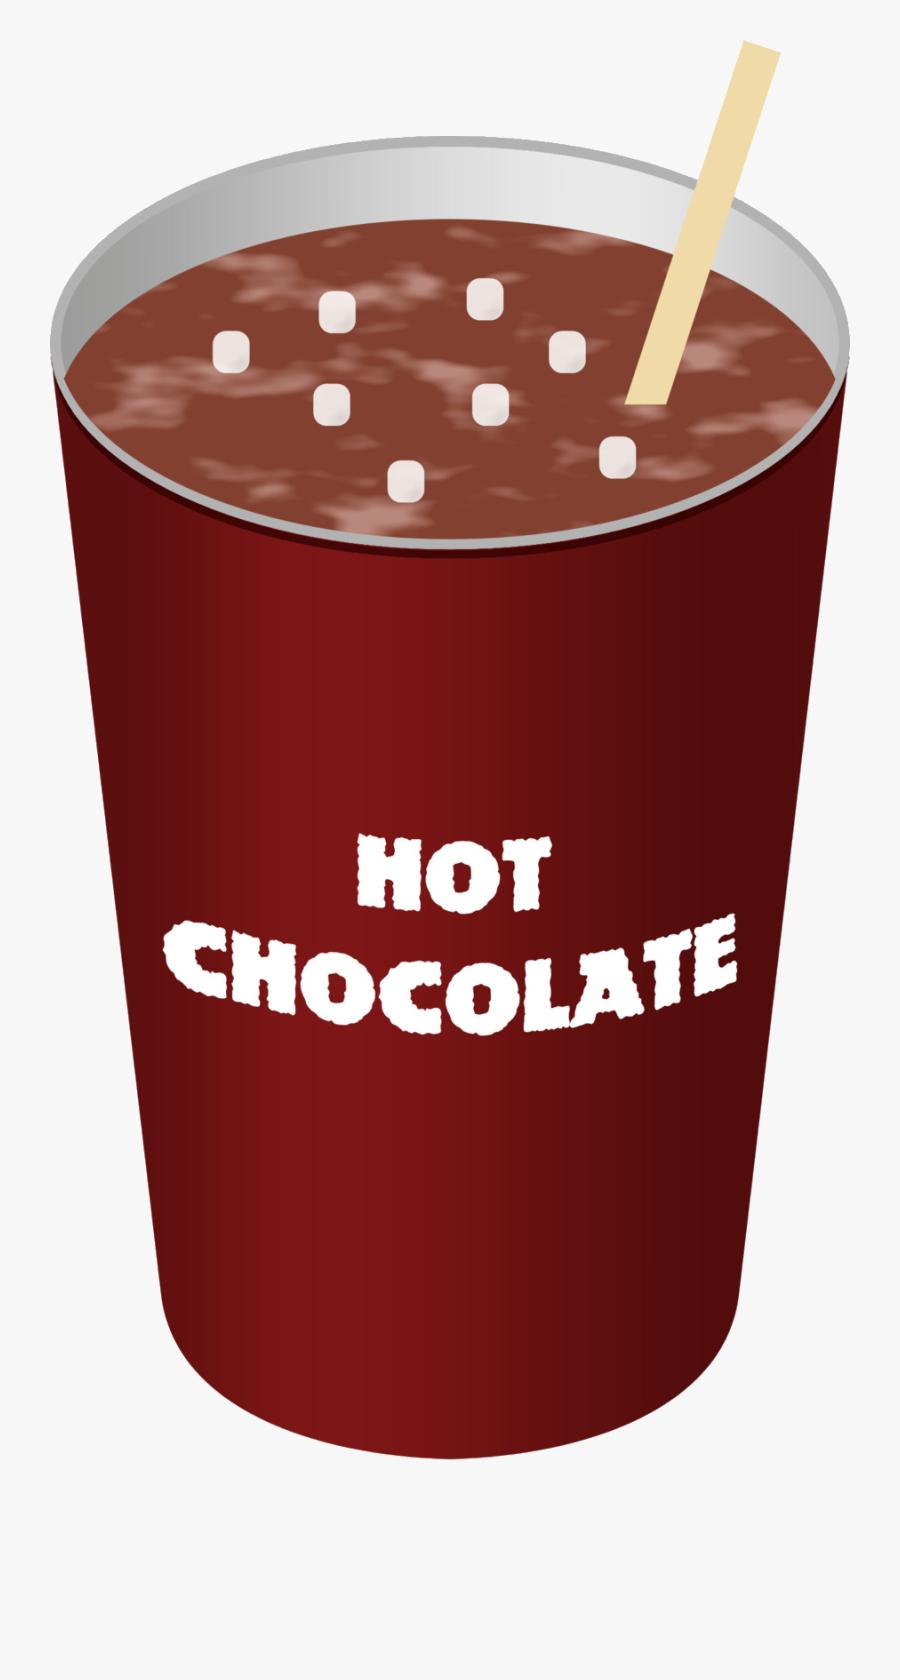 Hot Chocolate Milk Clip Art Cocoa Free Transparent - Hot Chocolate In A Cup Clipart, Transparent Clipart